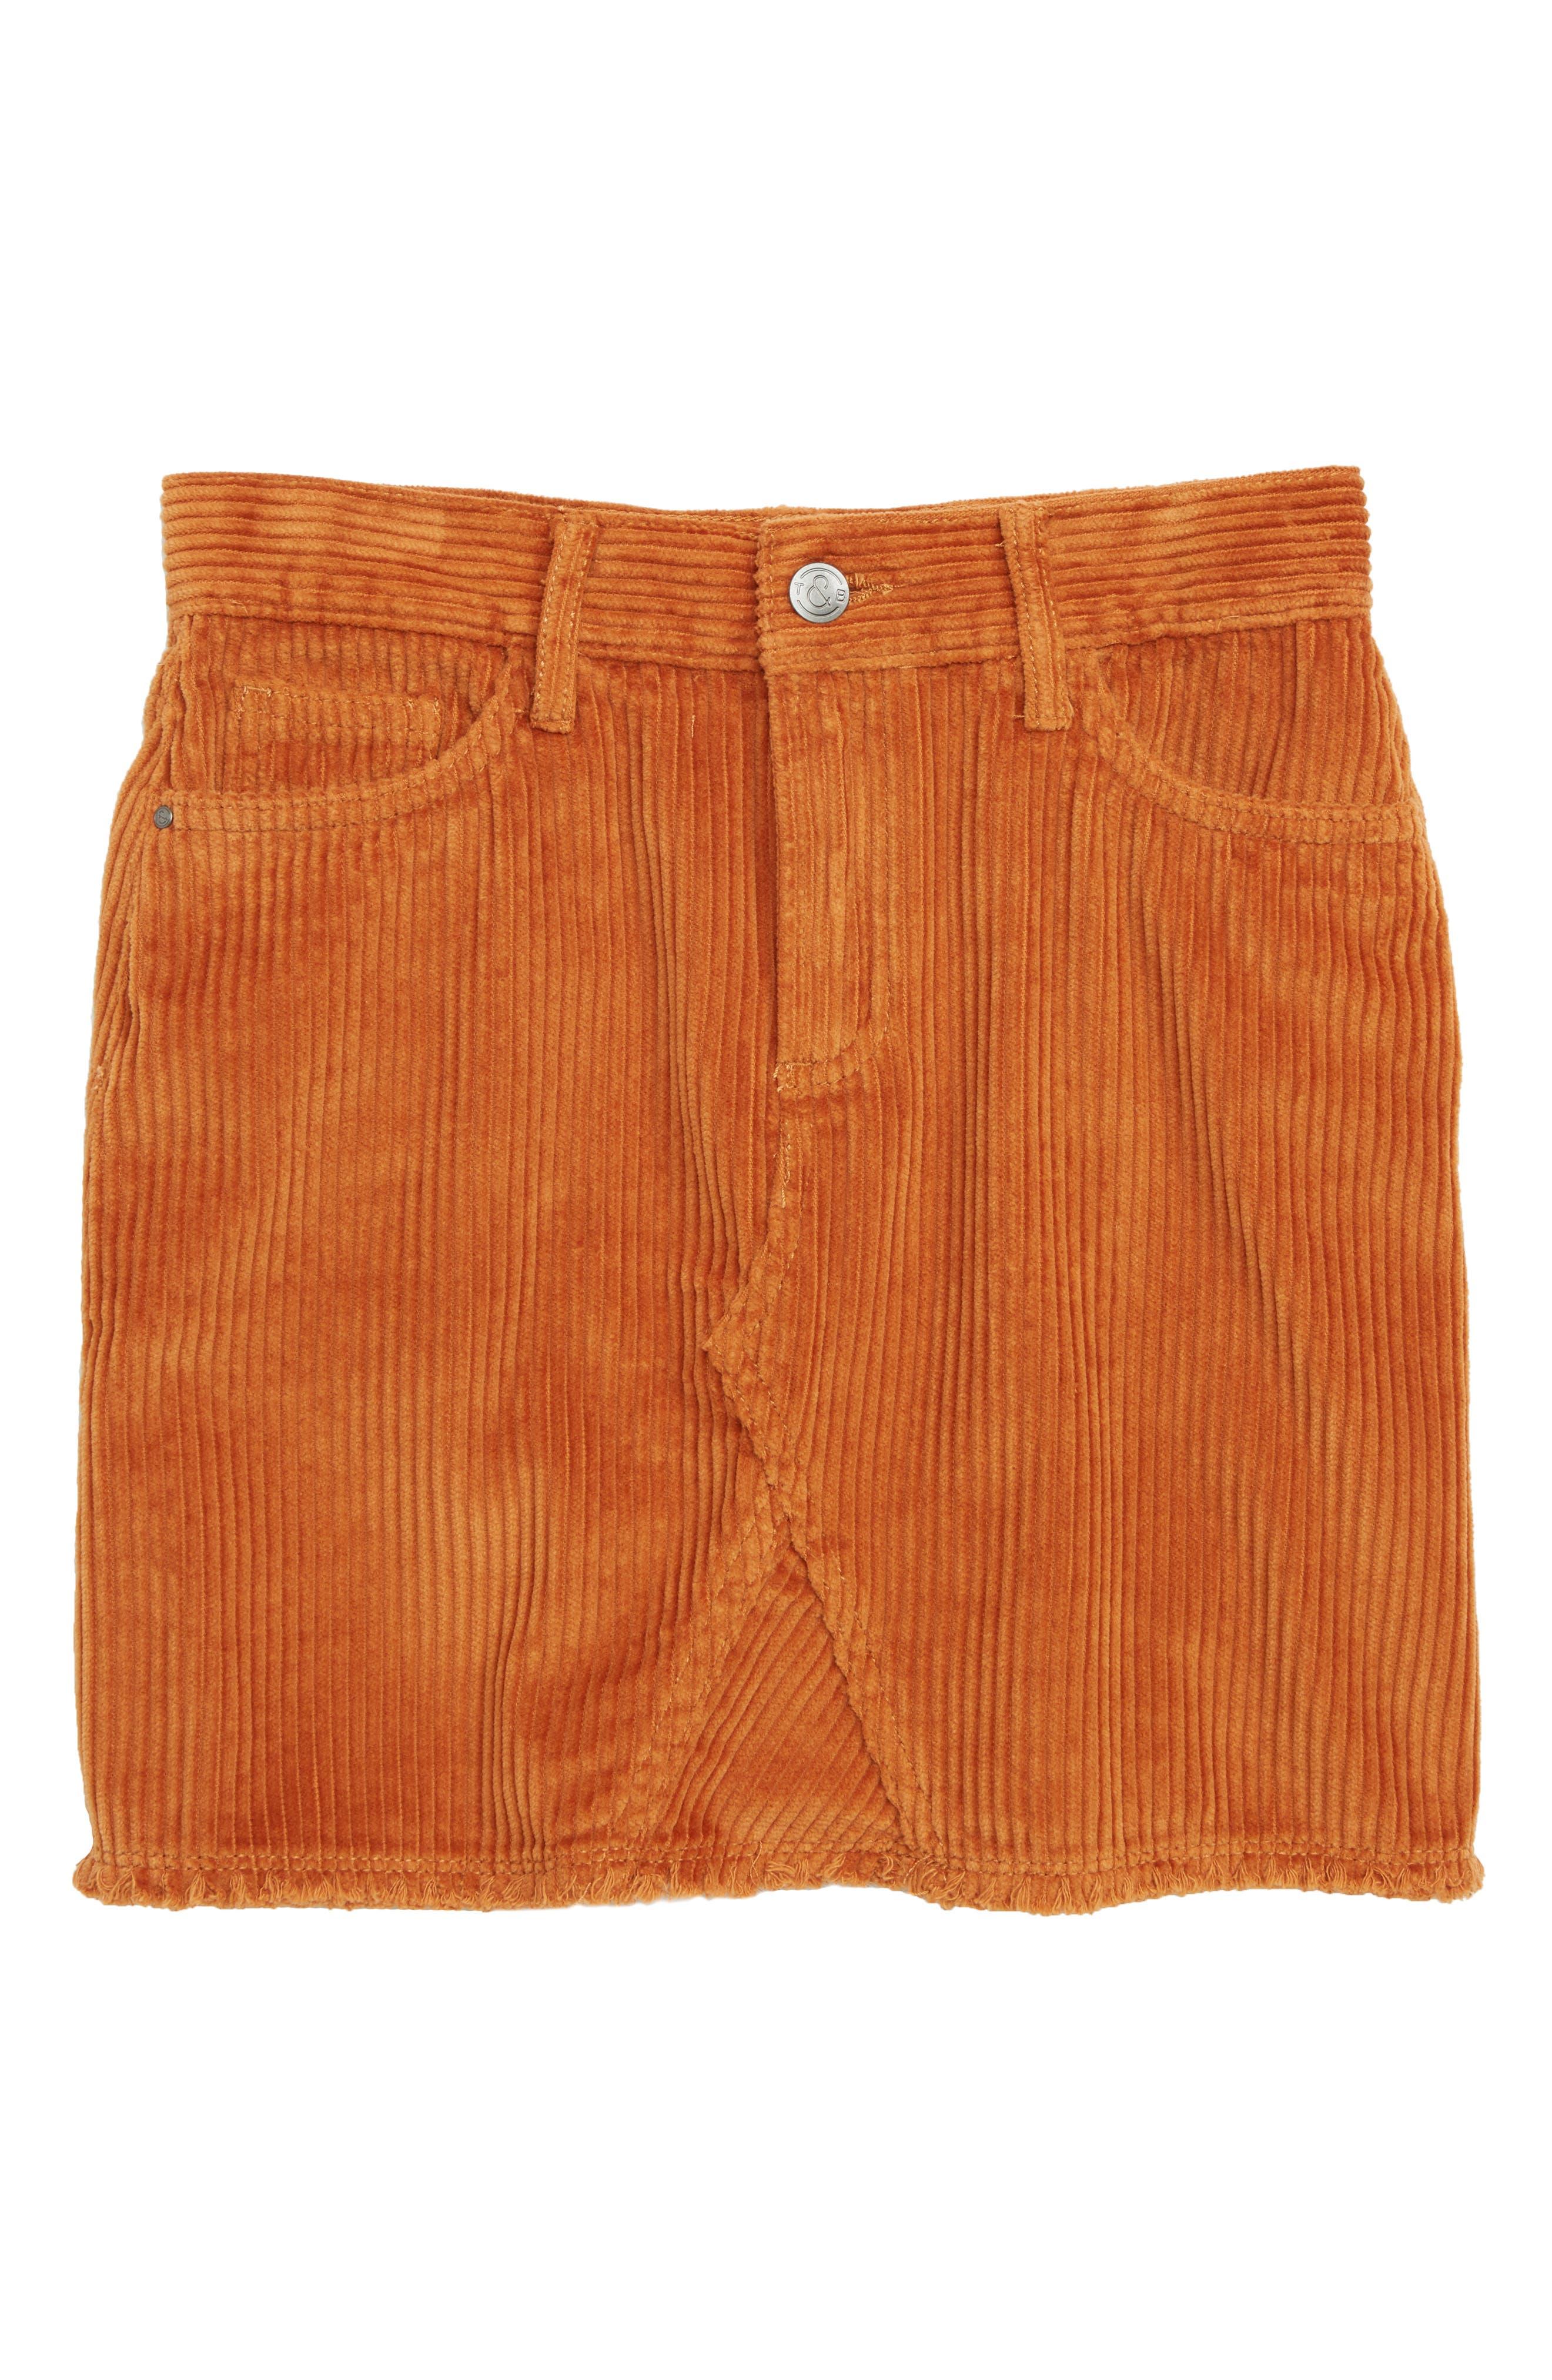 Corduroy Skirt,                         Main,                         color, TAN ADOBE